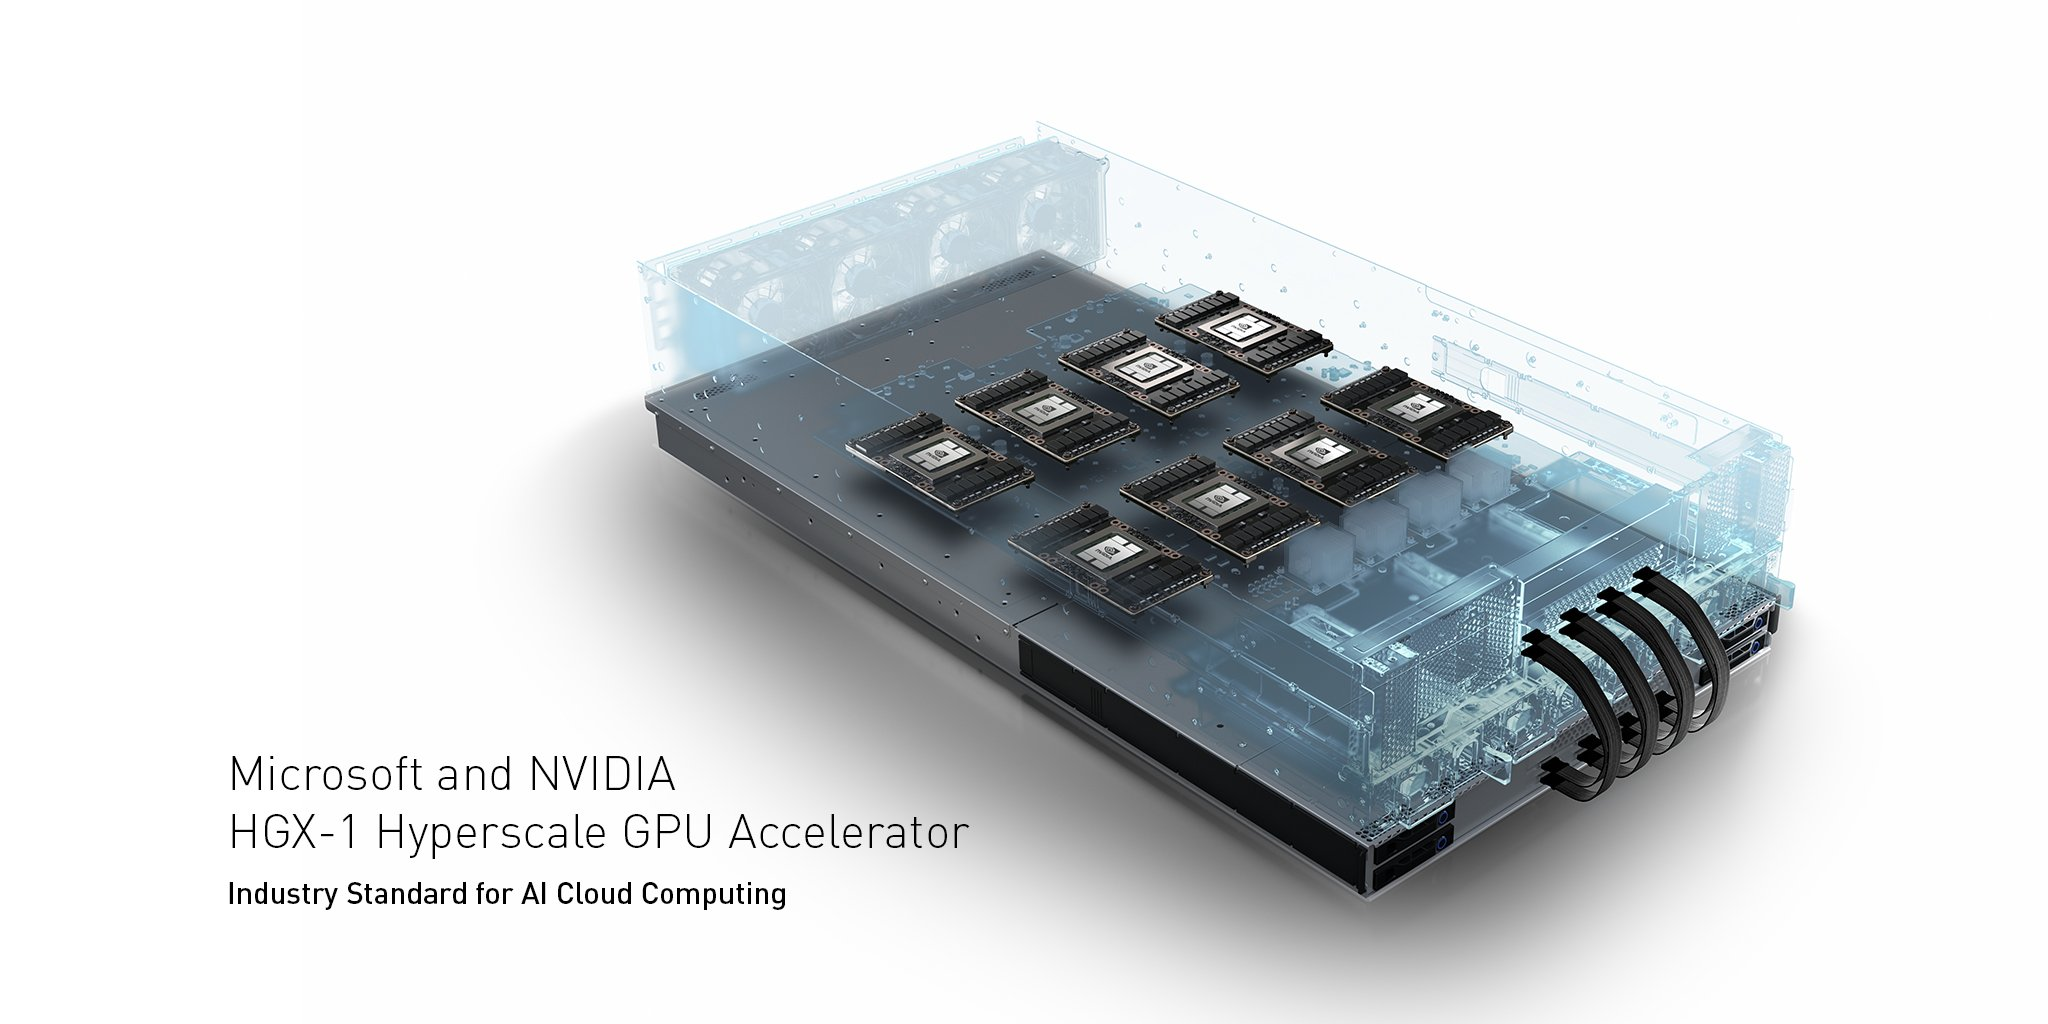 NVIDIA HGX-1